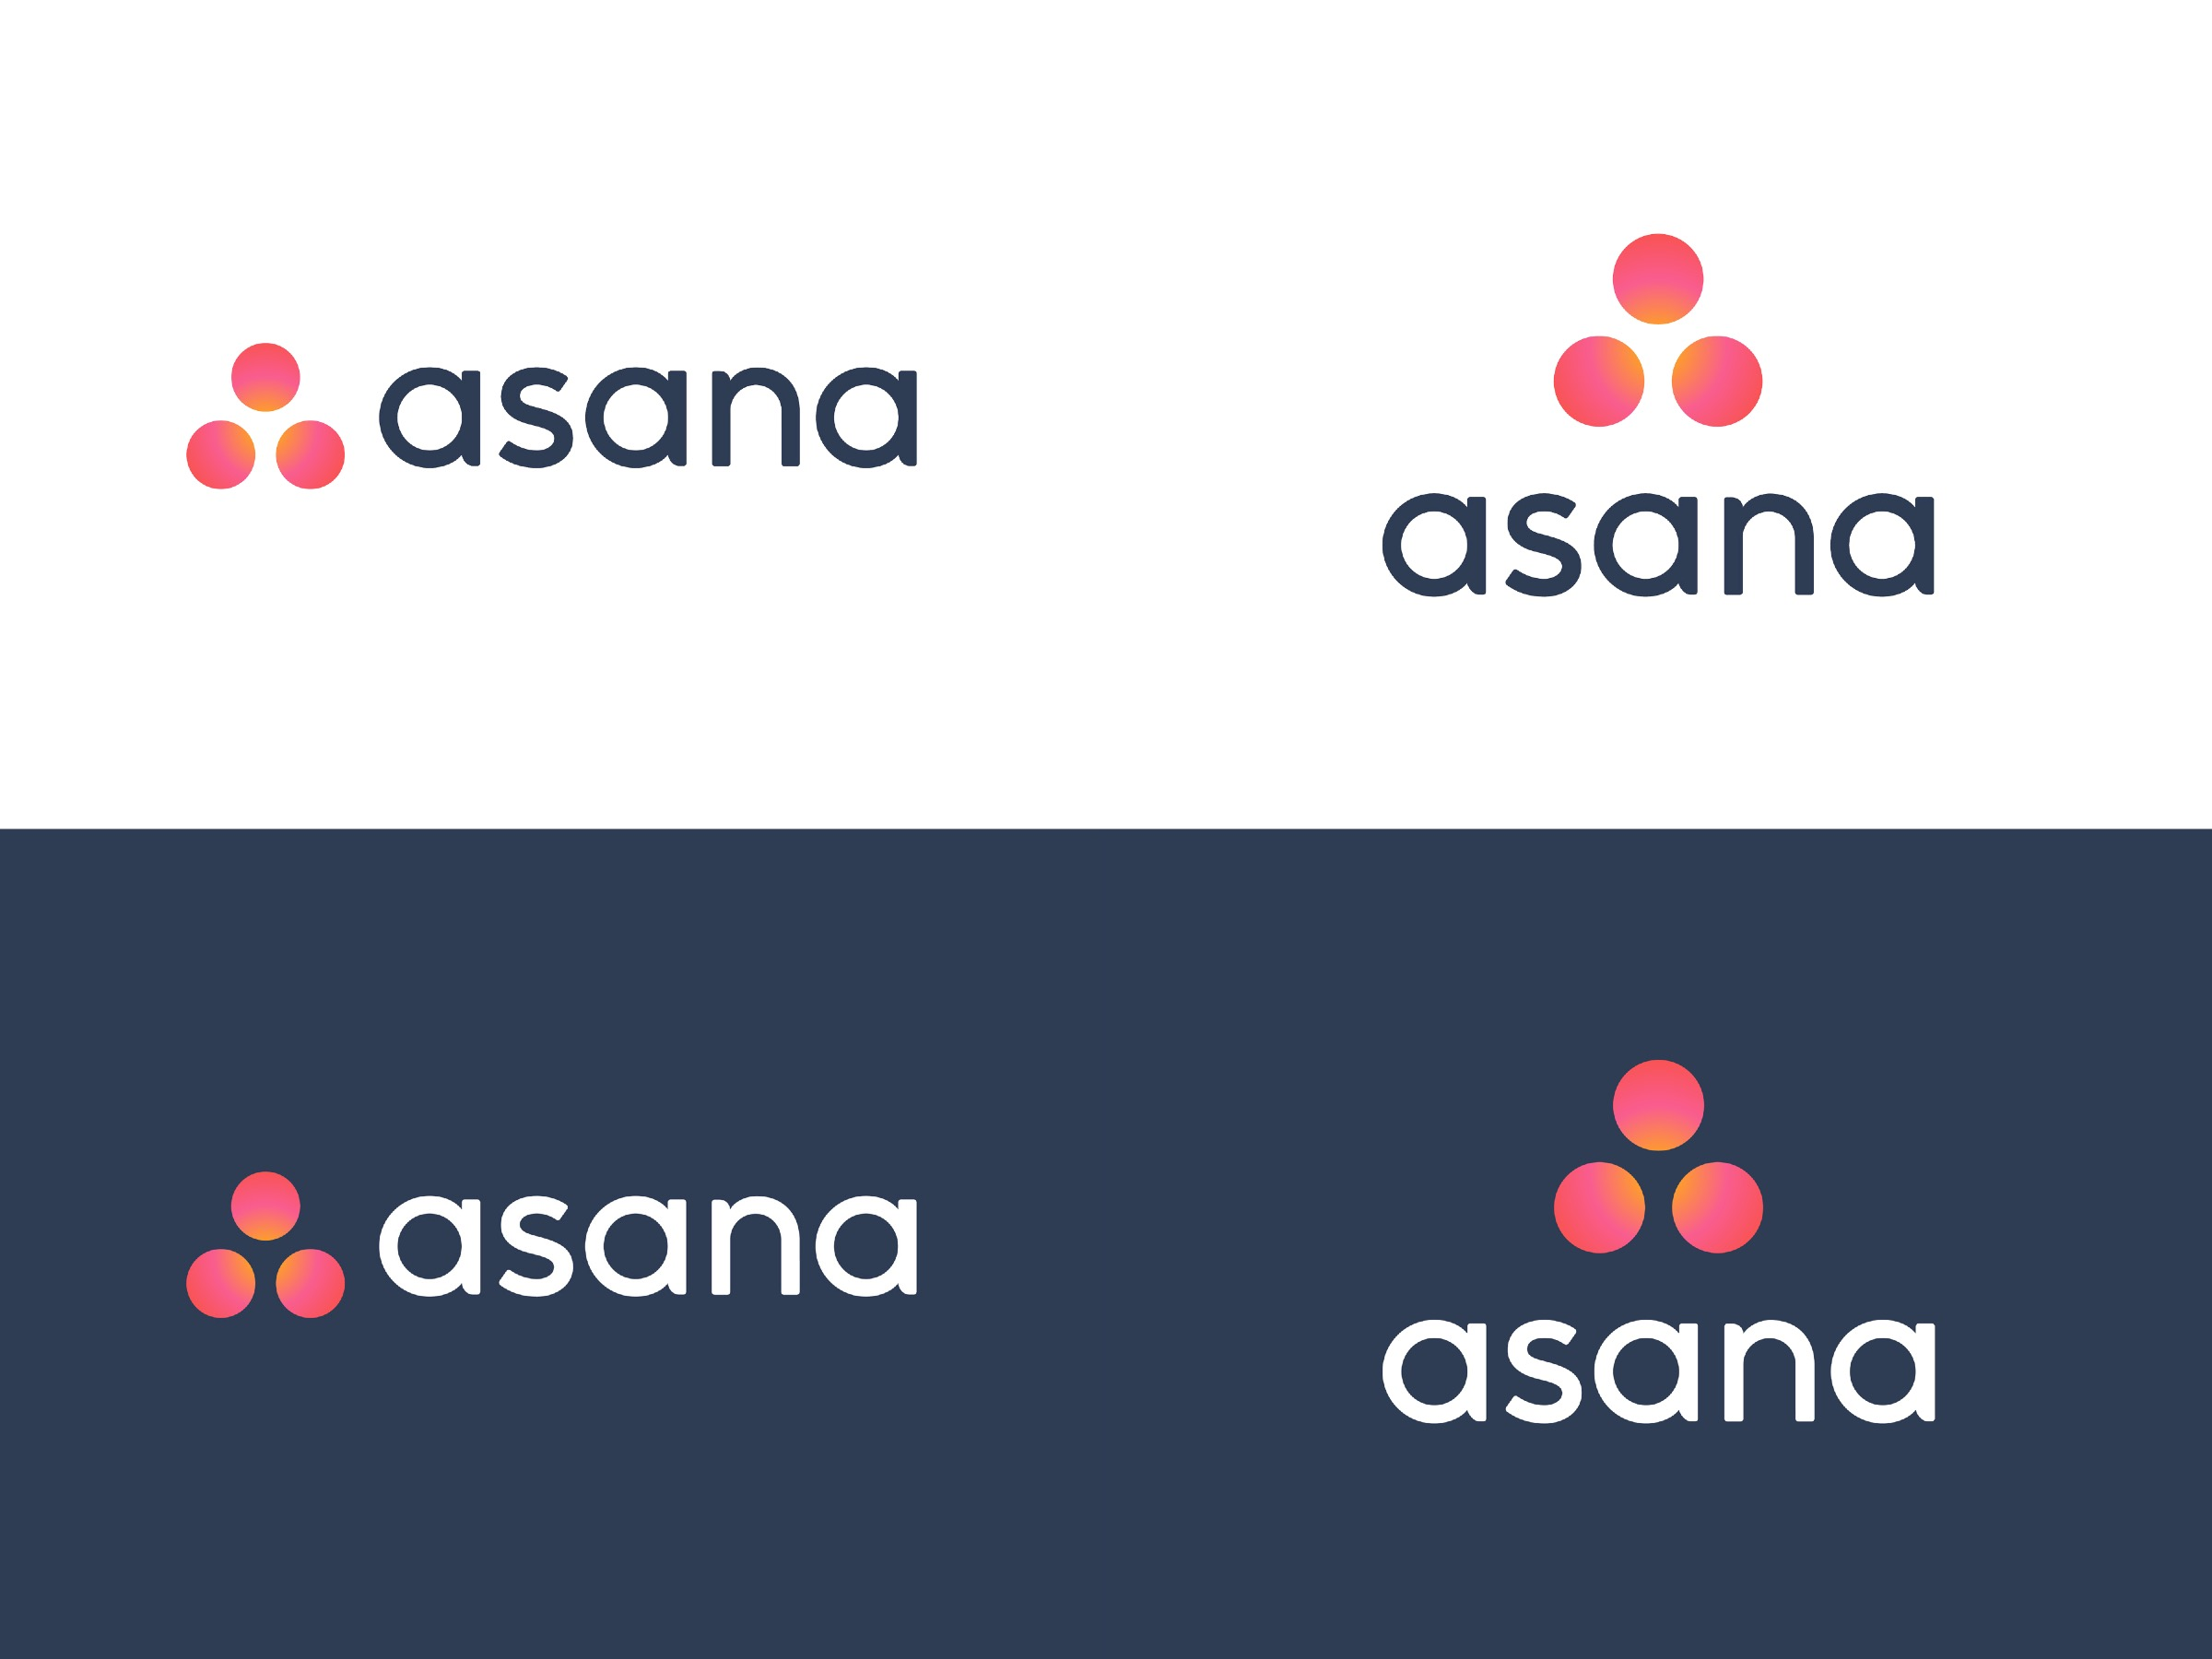 Asana-Brandbook-v1b 59.jpeg